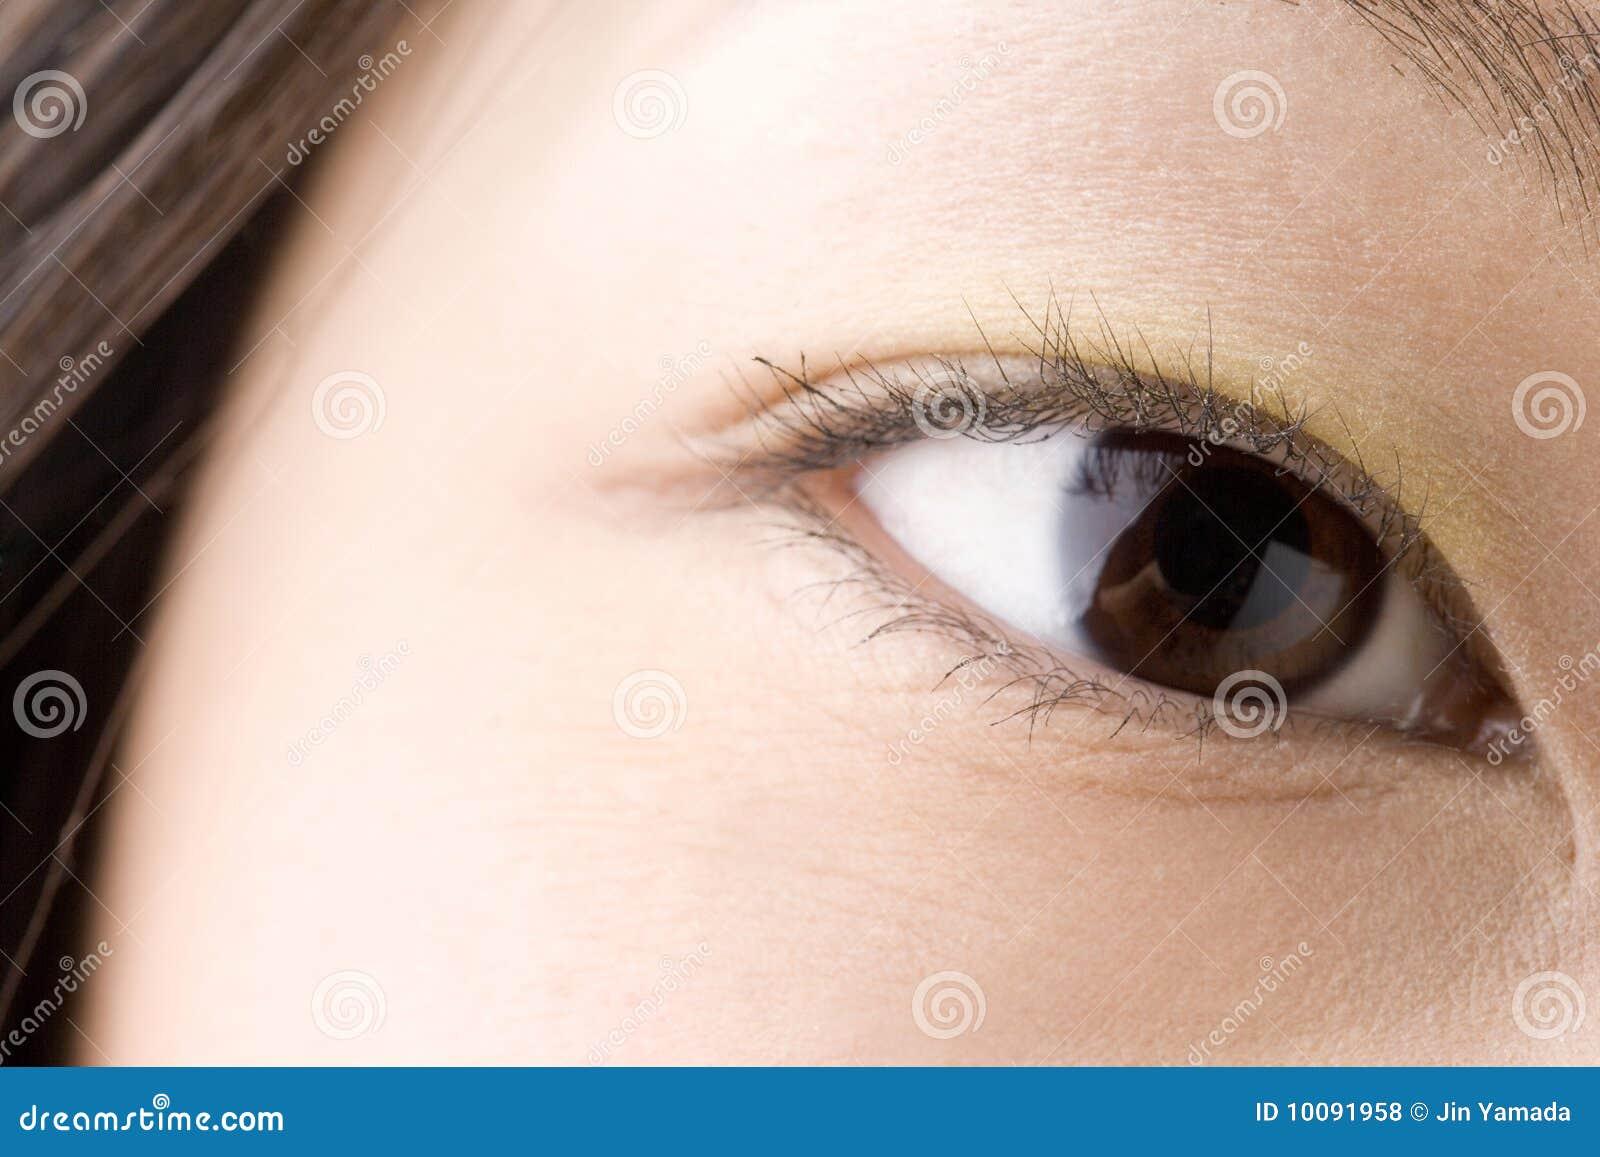 Black eye of Japanese